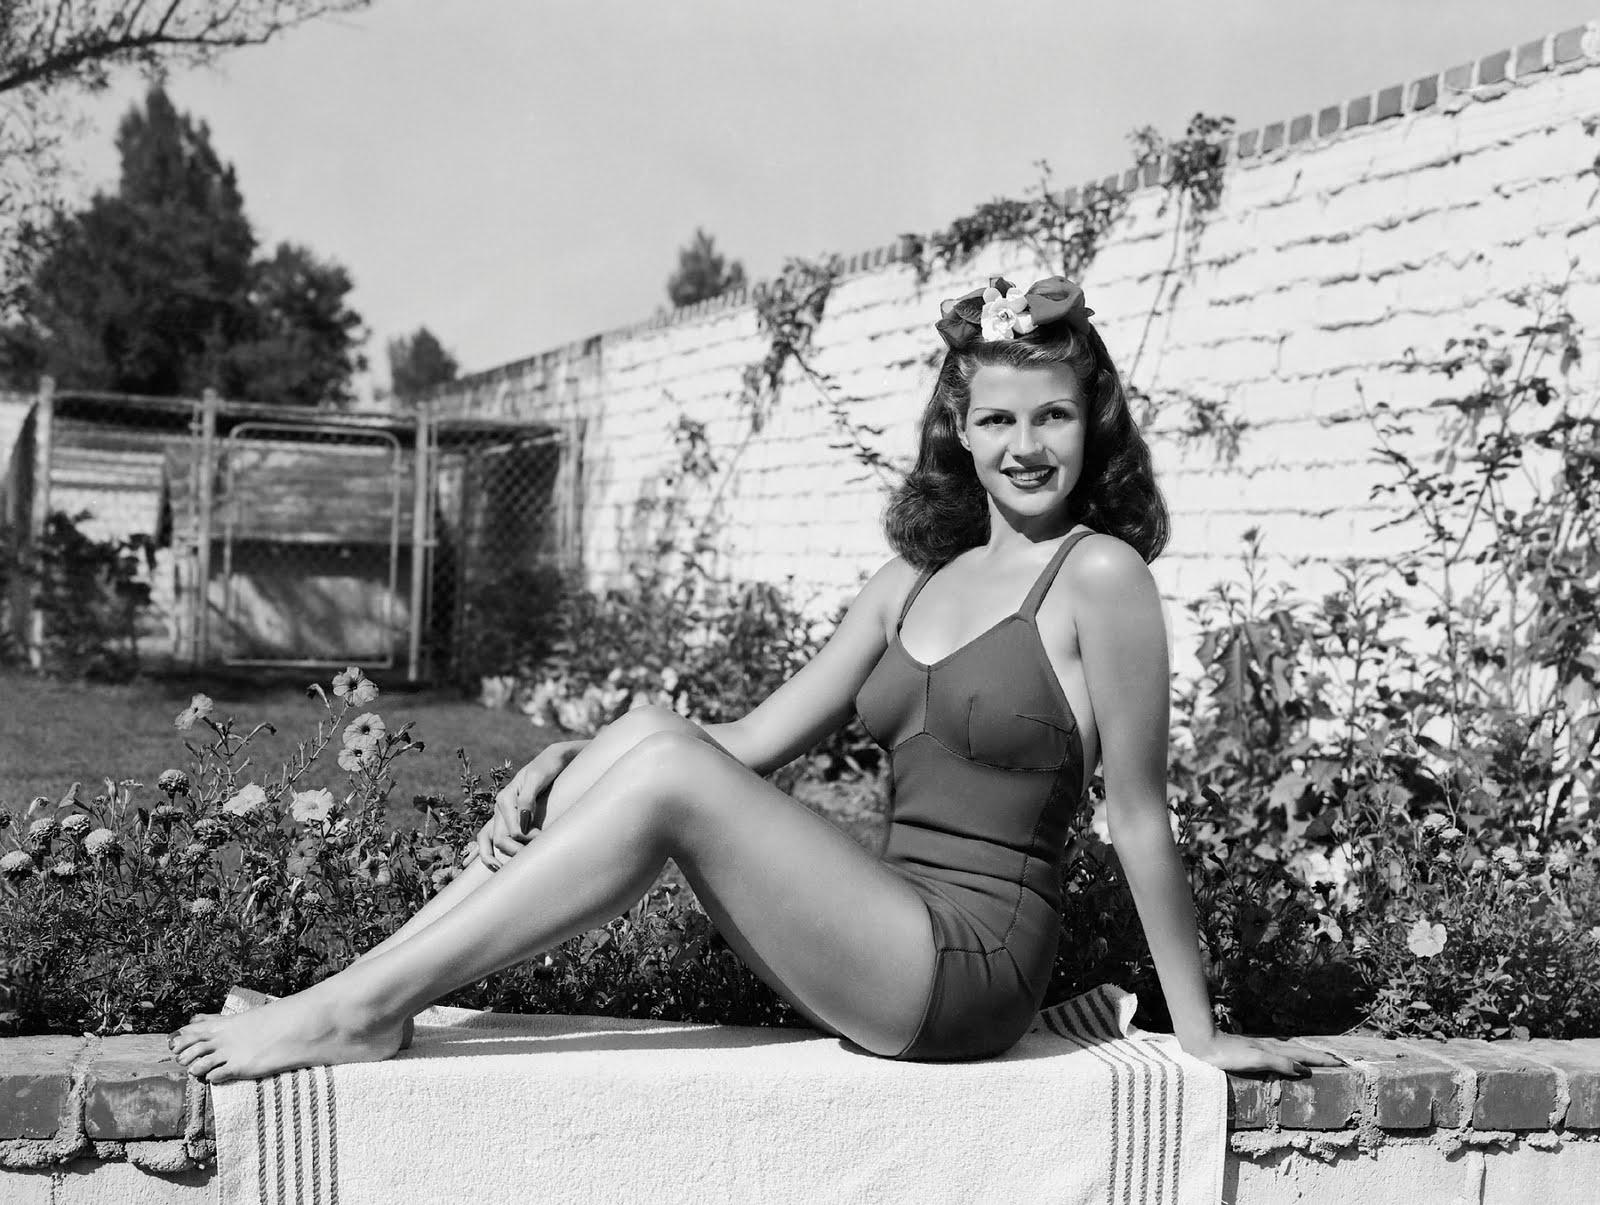 Rita Hayworth: A Free Bird In Flight • Rita's legs  |Rita Hayworth Feet